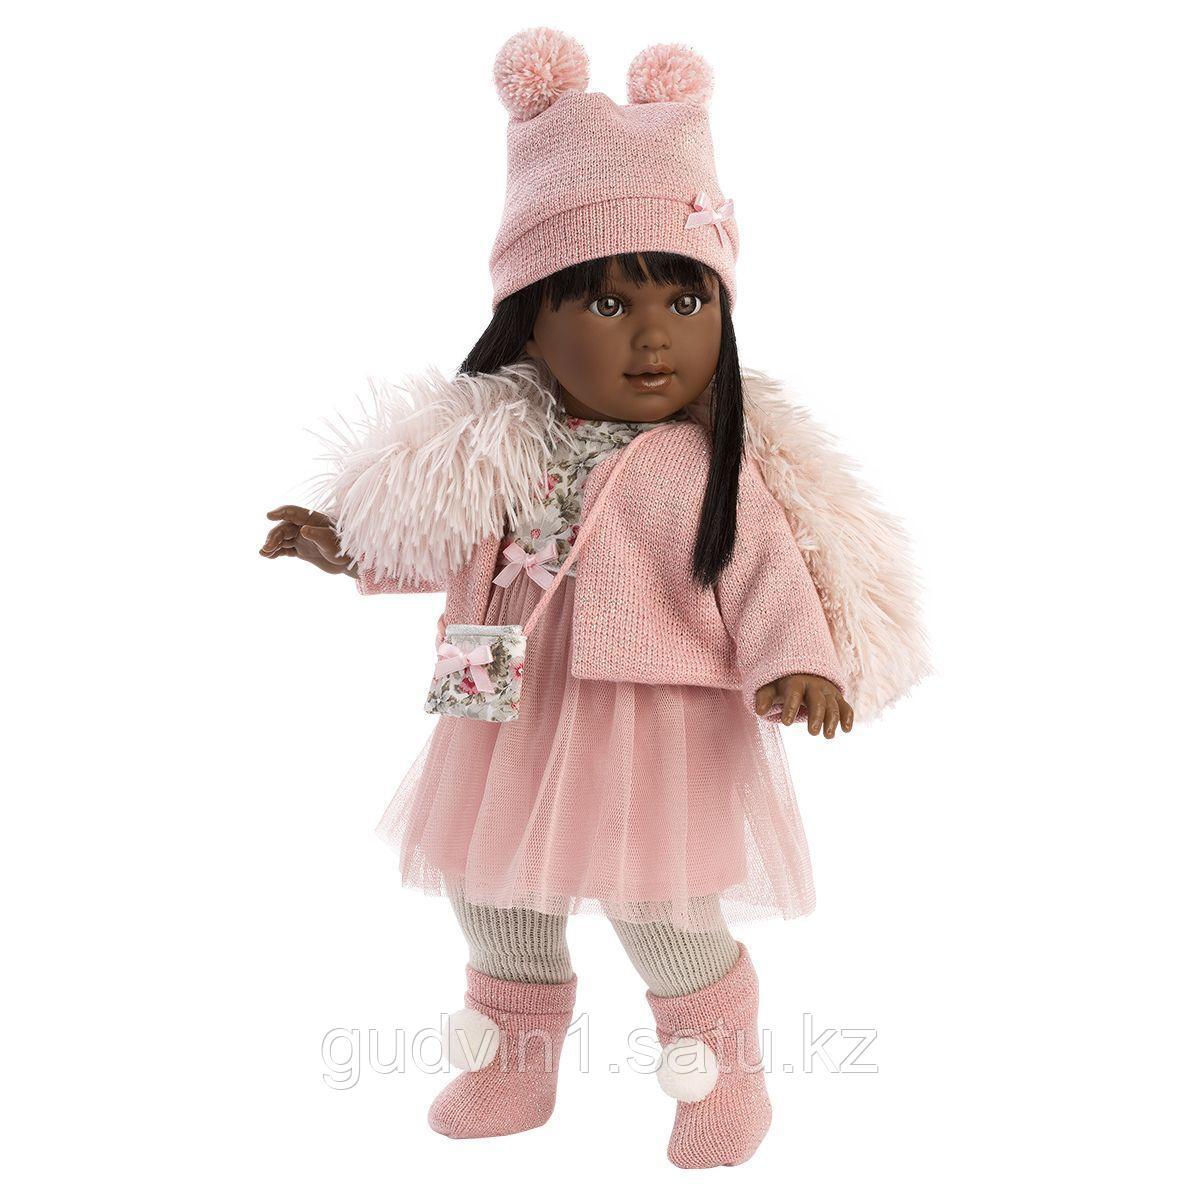 LLORENS: Кукла Мартина 40 см., мулатка в розовом пальто и шапочке 54031